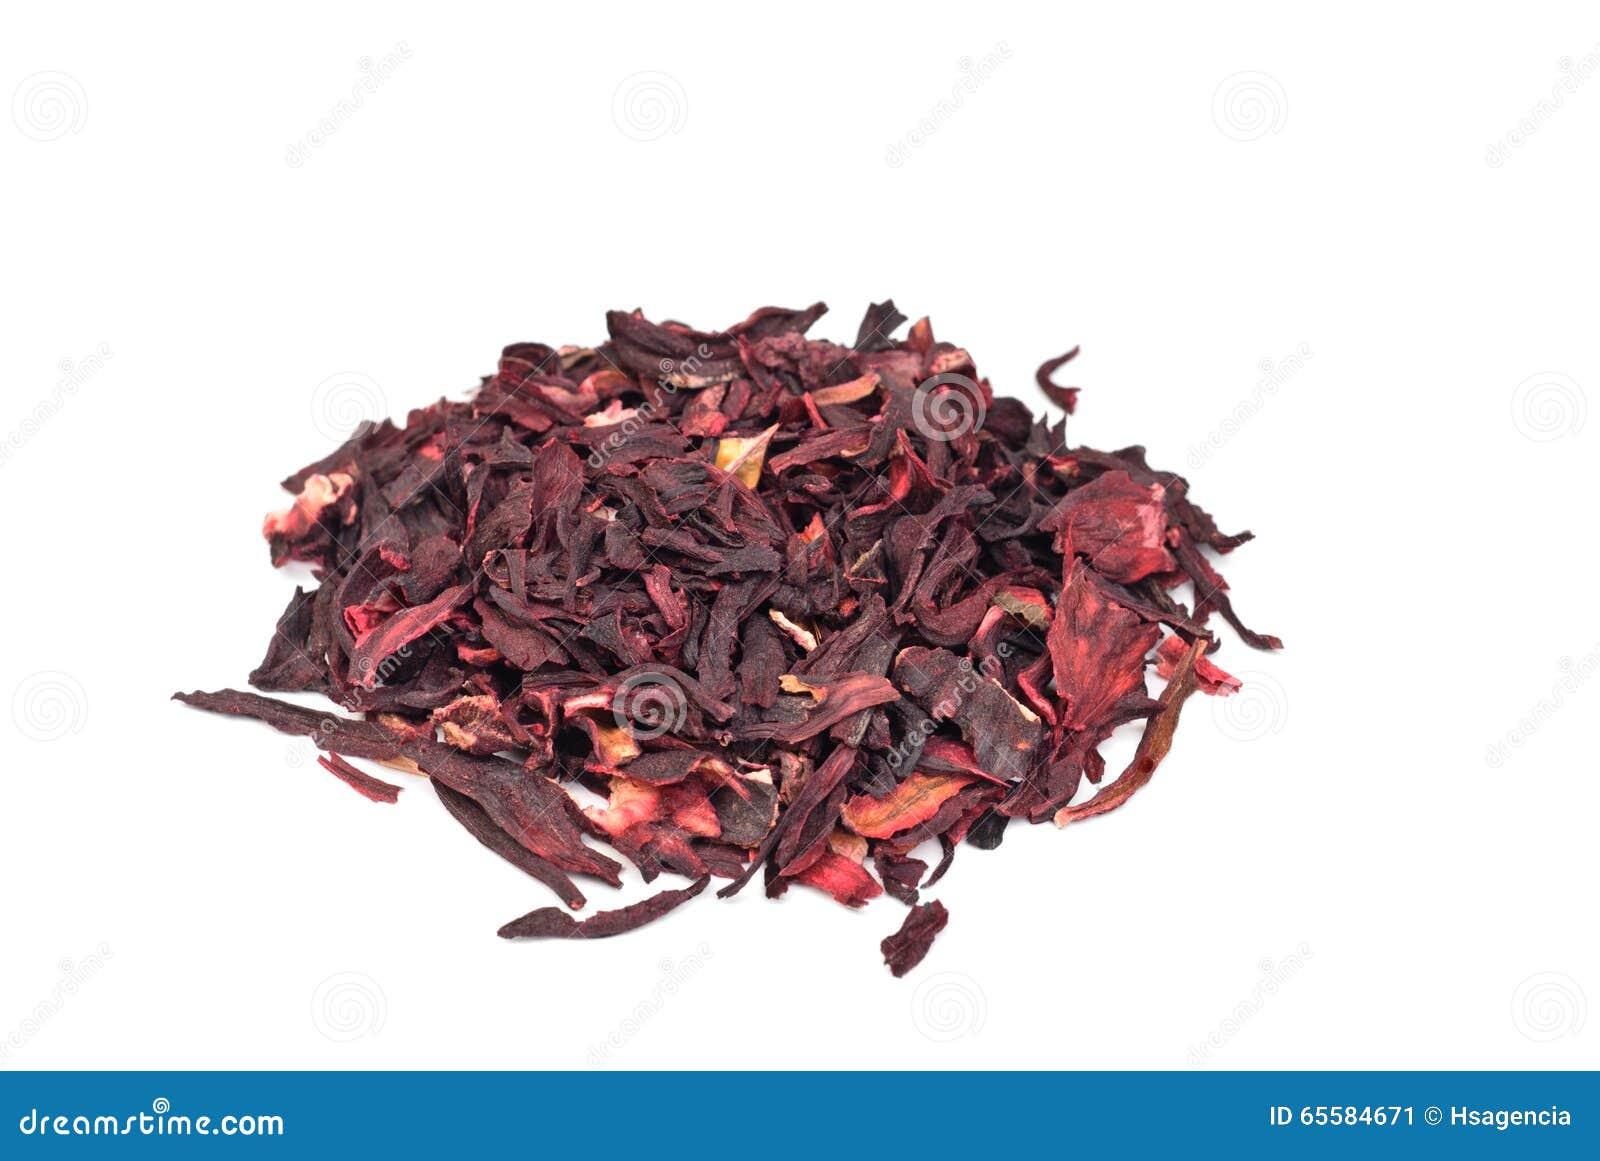 Hibiscus Tea Macro Dry Flower Stock Image Image Of Closeup Leaf